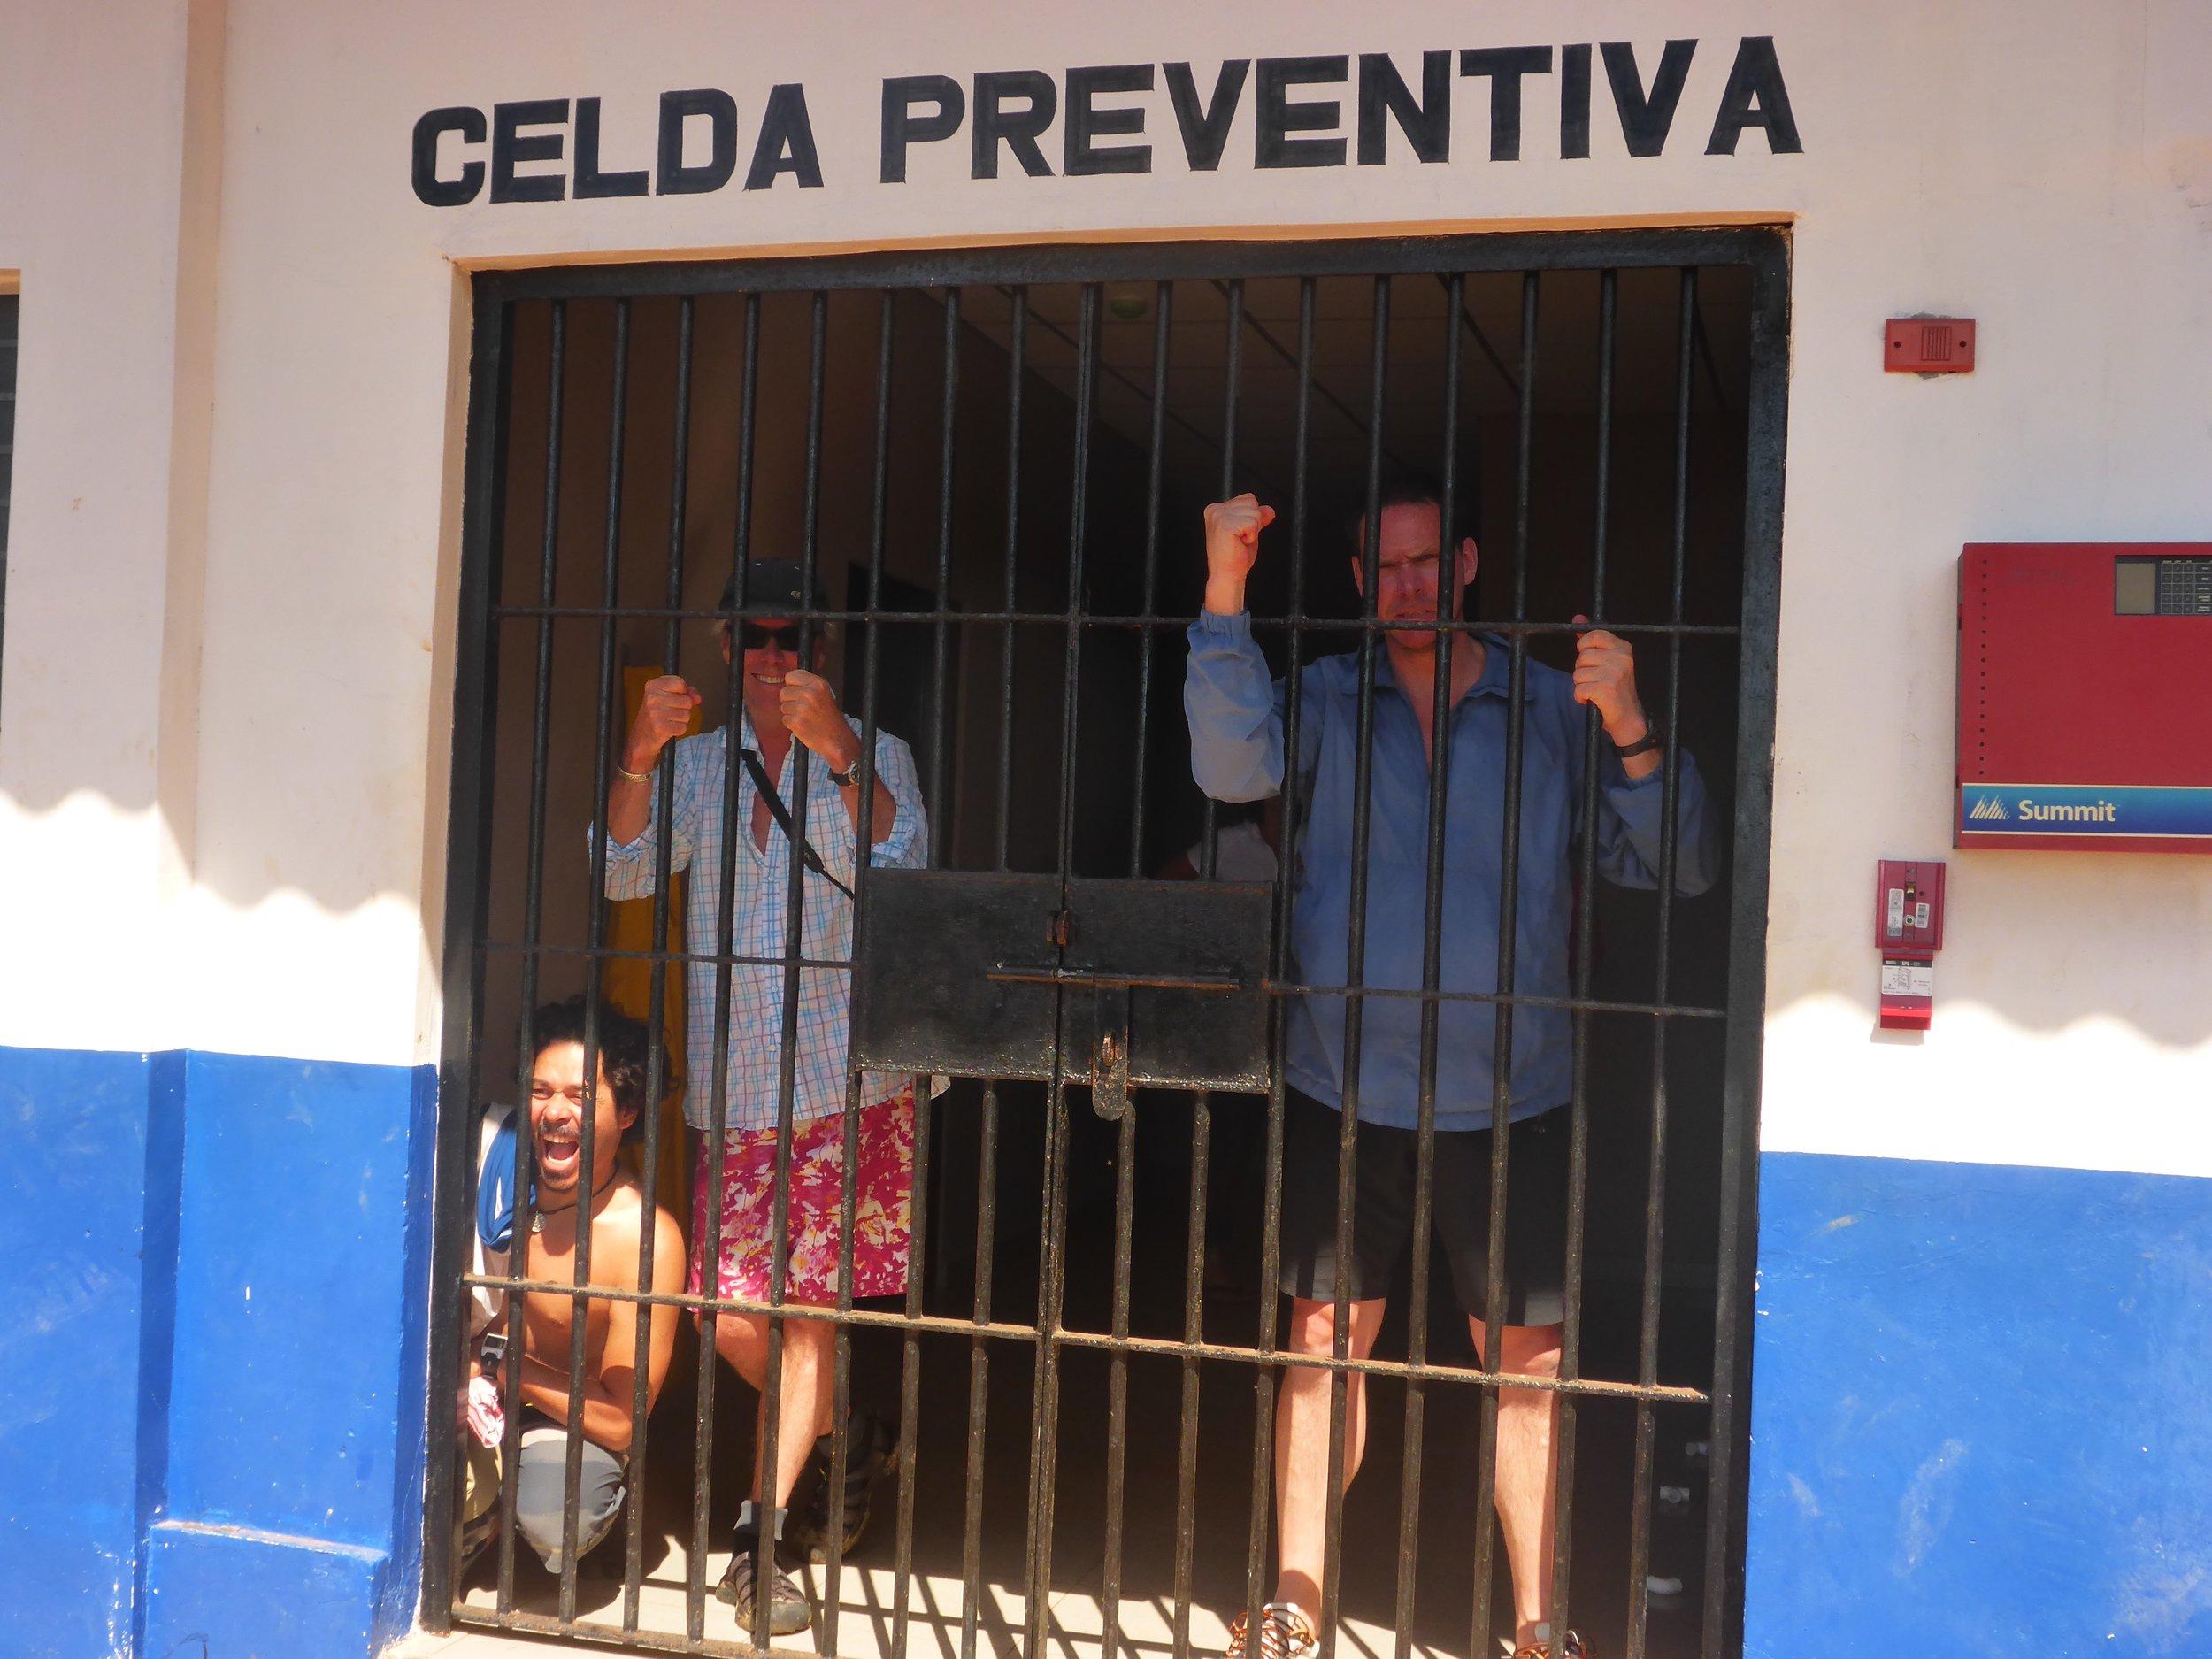 Coiba National Park, Santa Catalina, Panama, Fluid Adventures, Sea Kayak, UNESCO World Heritage Site, Snorkeling, Pacific Ocean, Veraguas, Adventure Trip